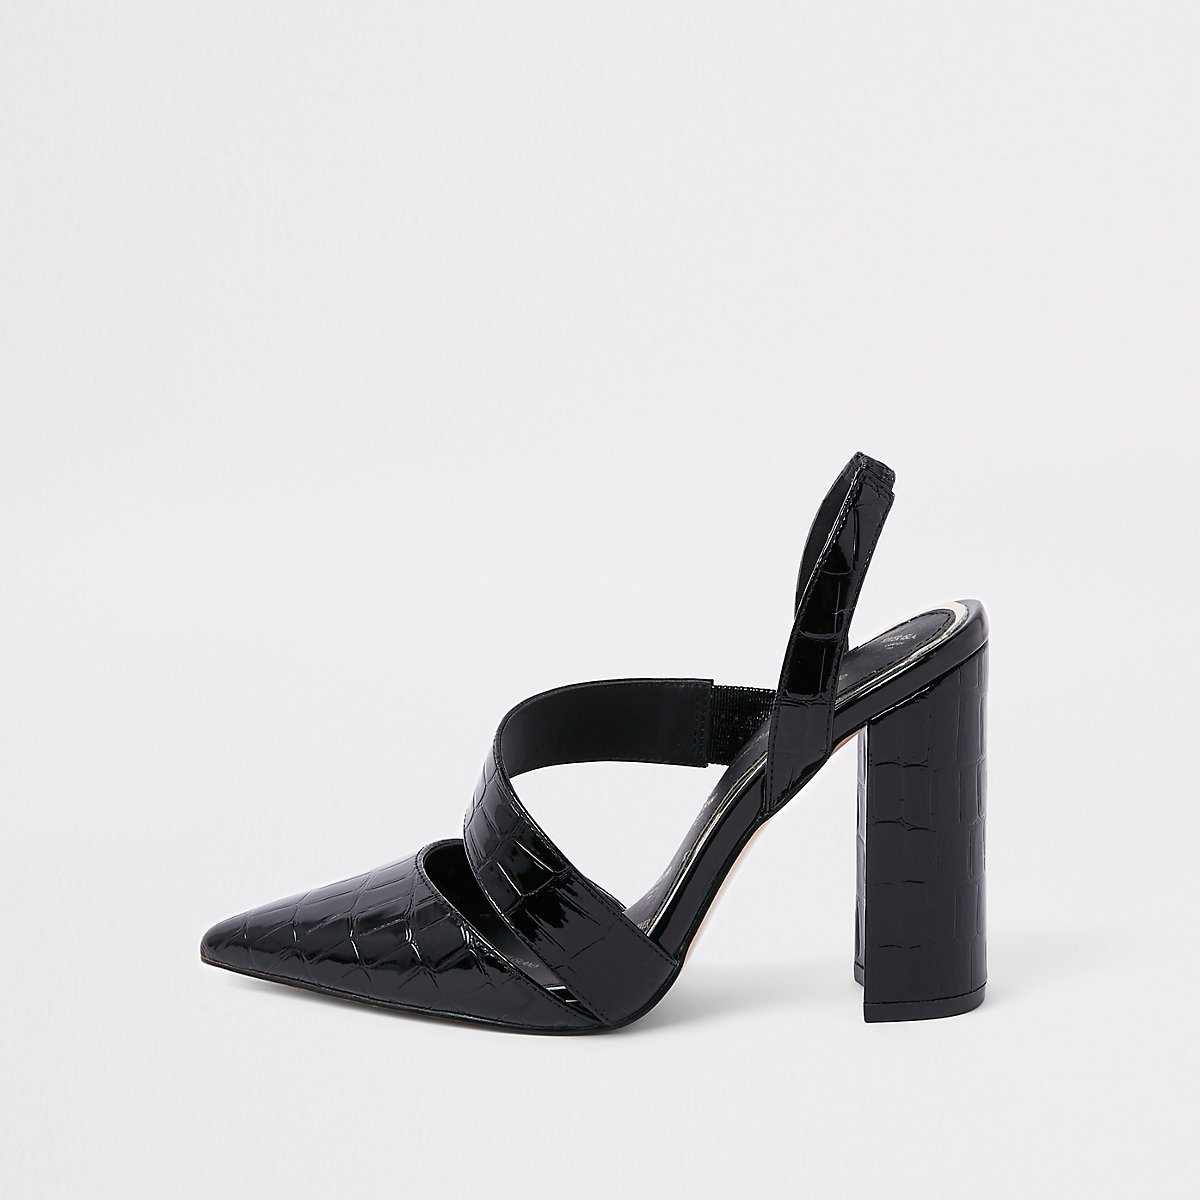 Zwarte pumps met krokodillenprint en asymmetrische blokhak